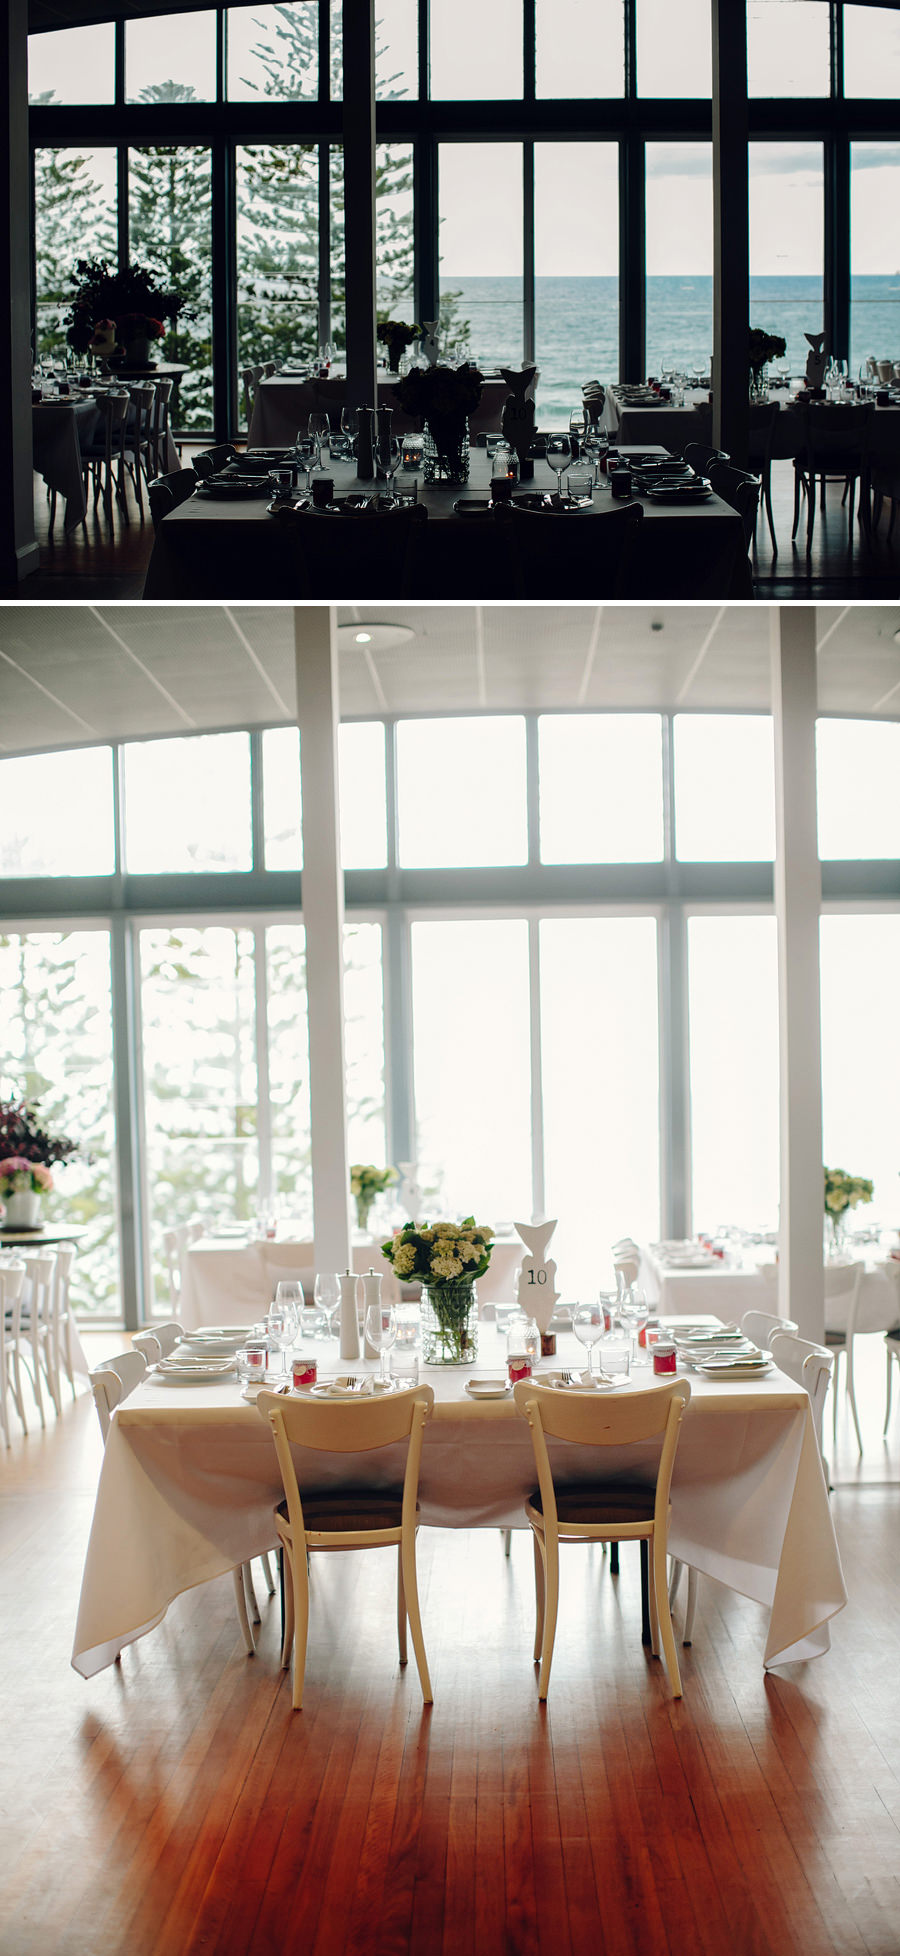 Moby Dicks Wedding Photographers: Reception